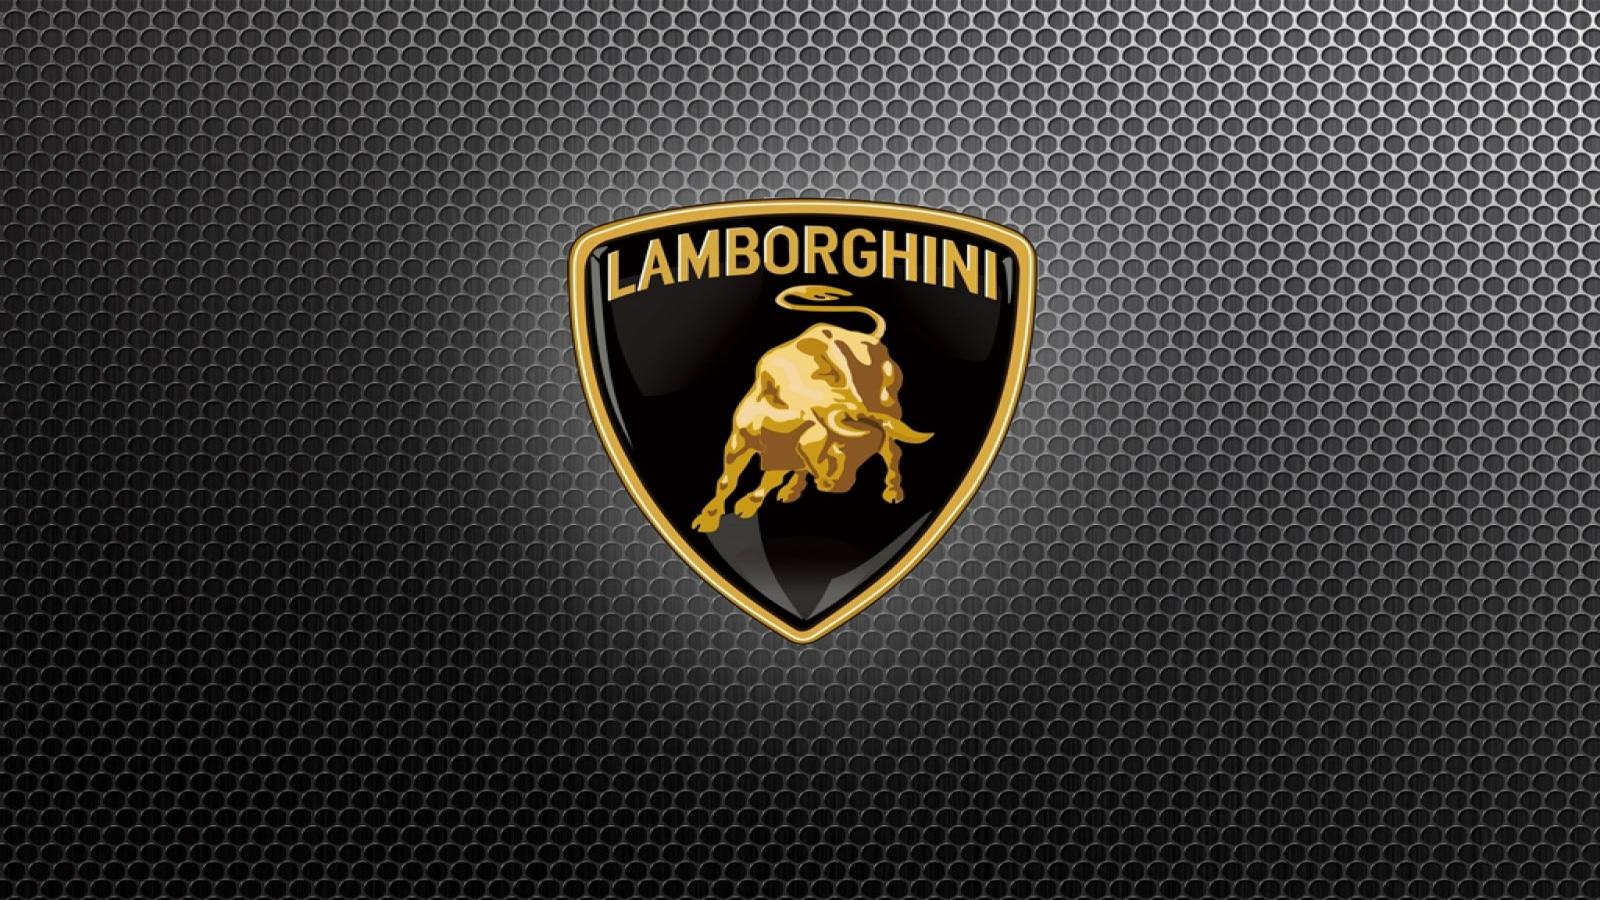 lamborghini logo wallpaper9 - photo #3